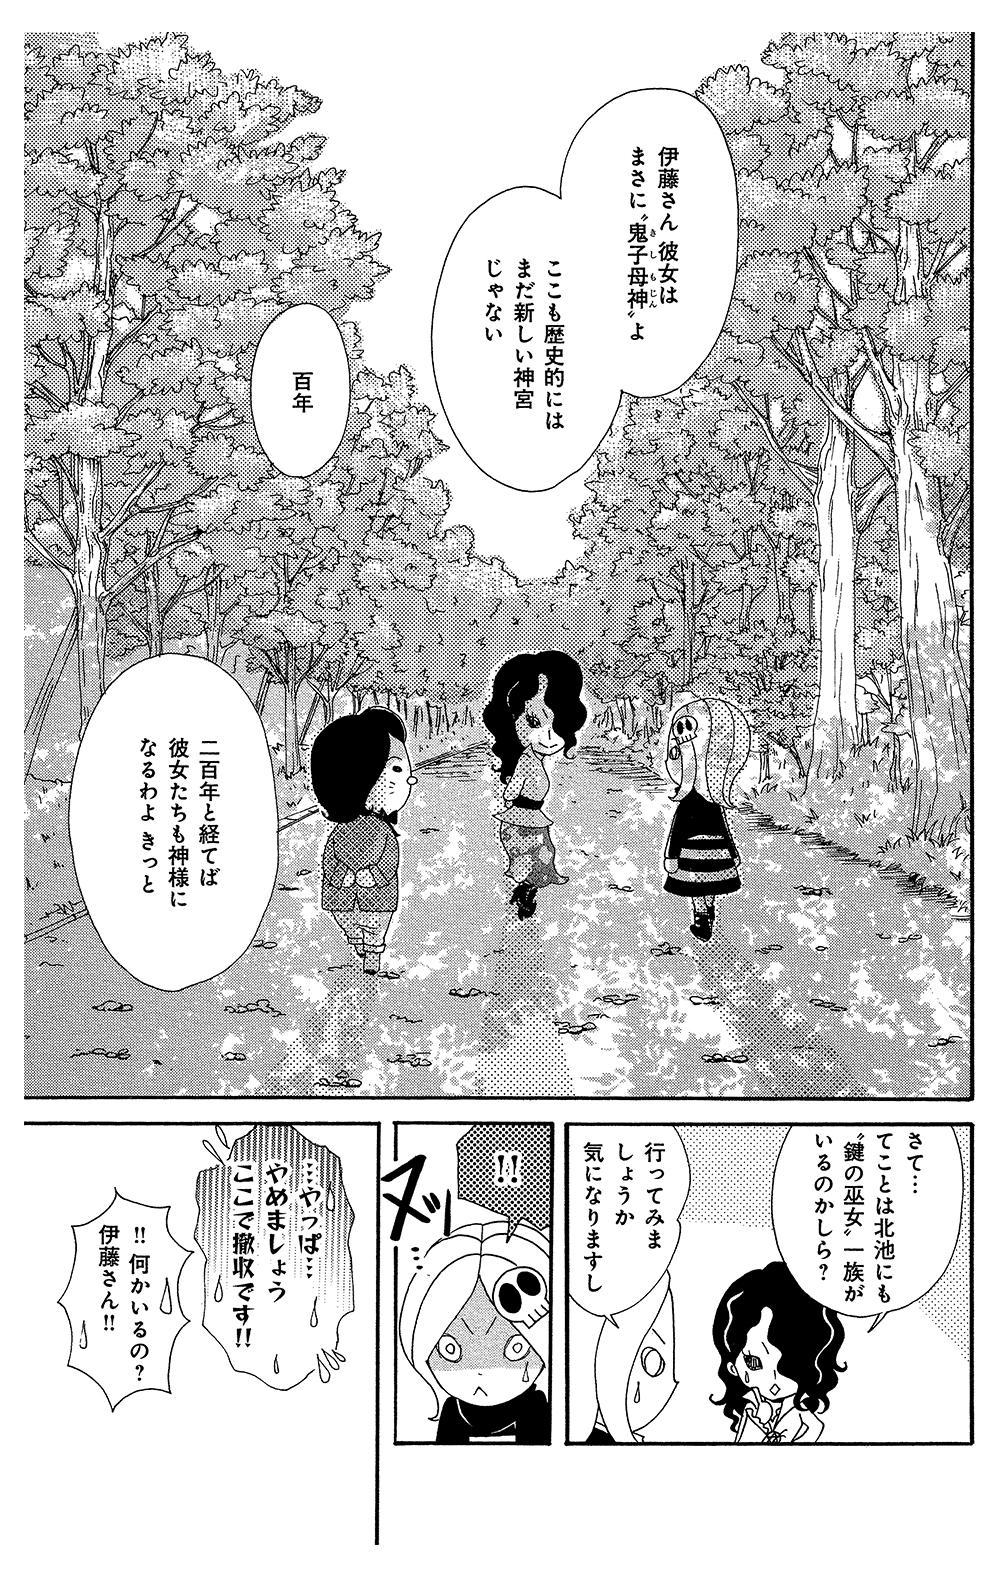 スピ☆散歩 第2話「清正井と明治神宮」②spsanp04-08.jpg